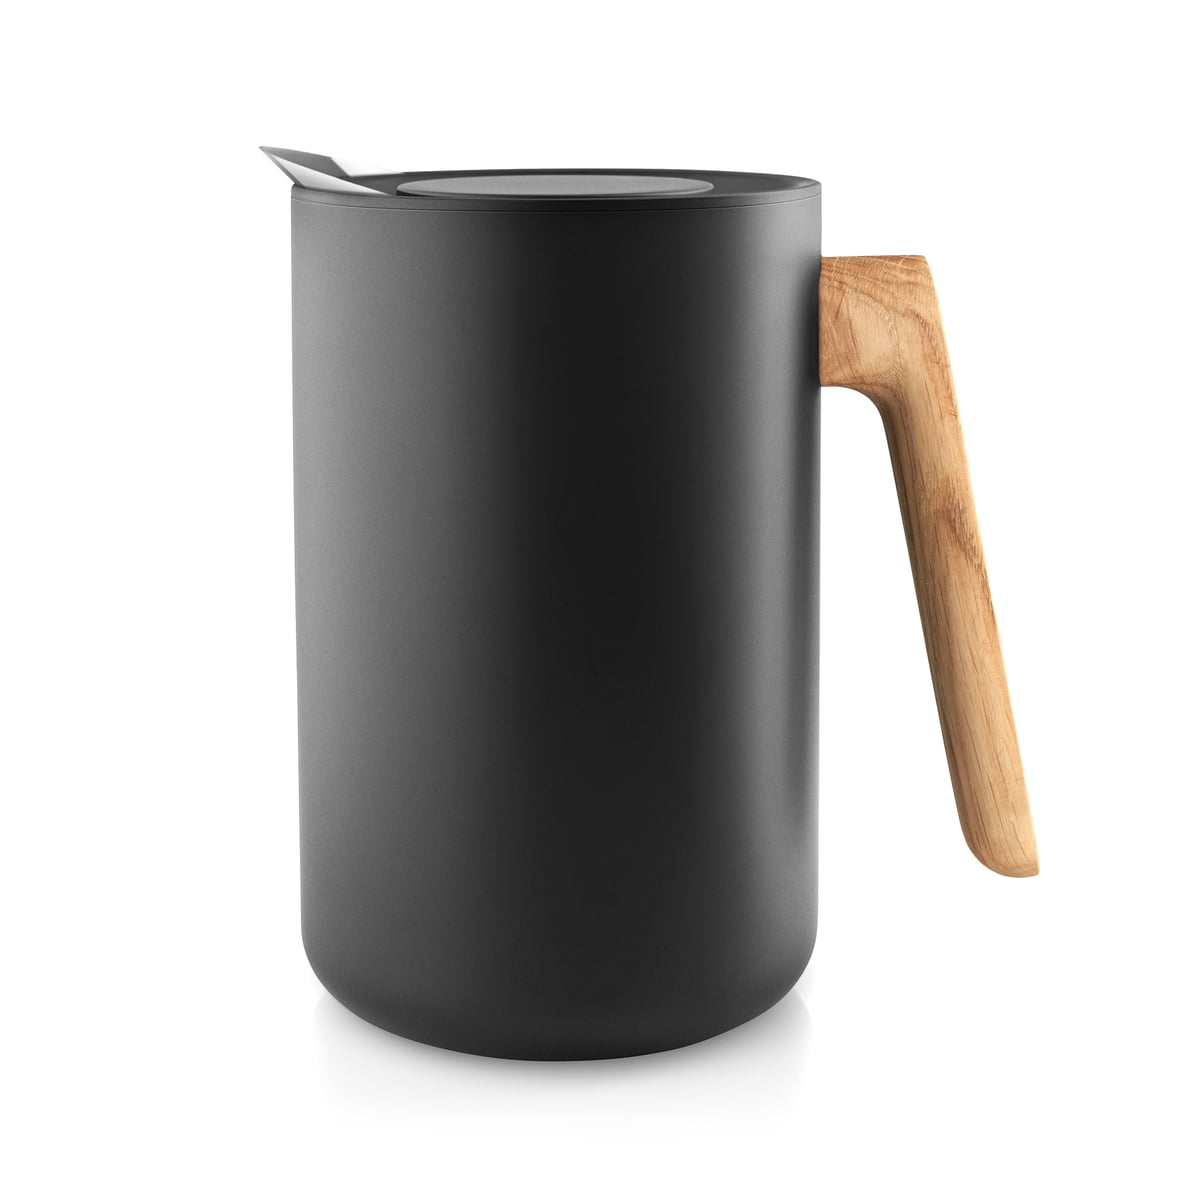 nordic kitchen vacuum jug. Black Bedroom Furniture Sets. Home Design Ideas